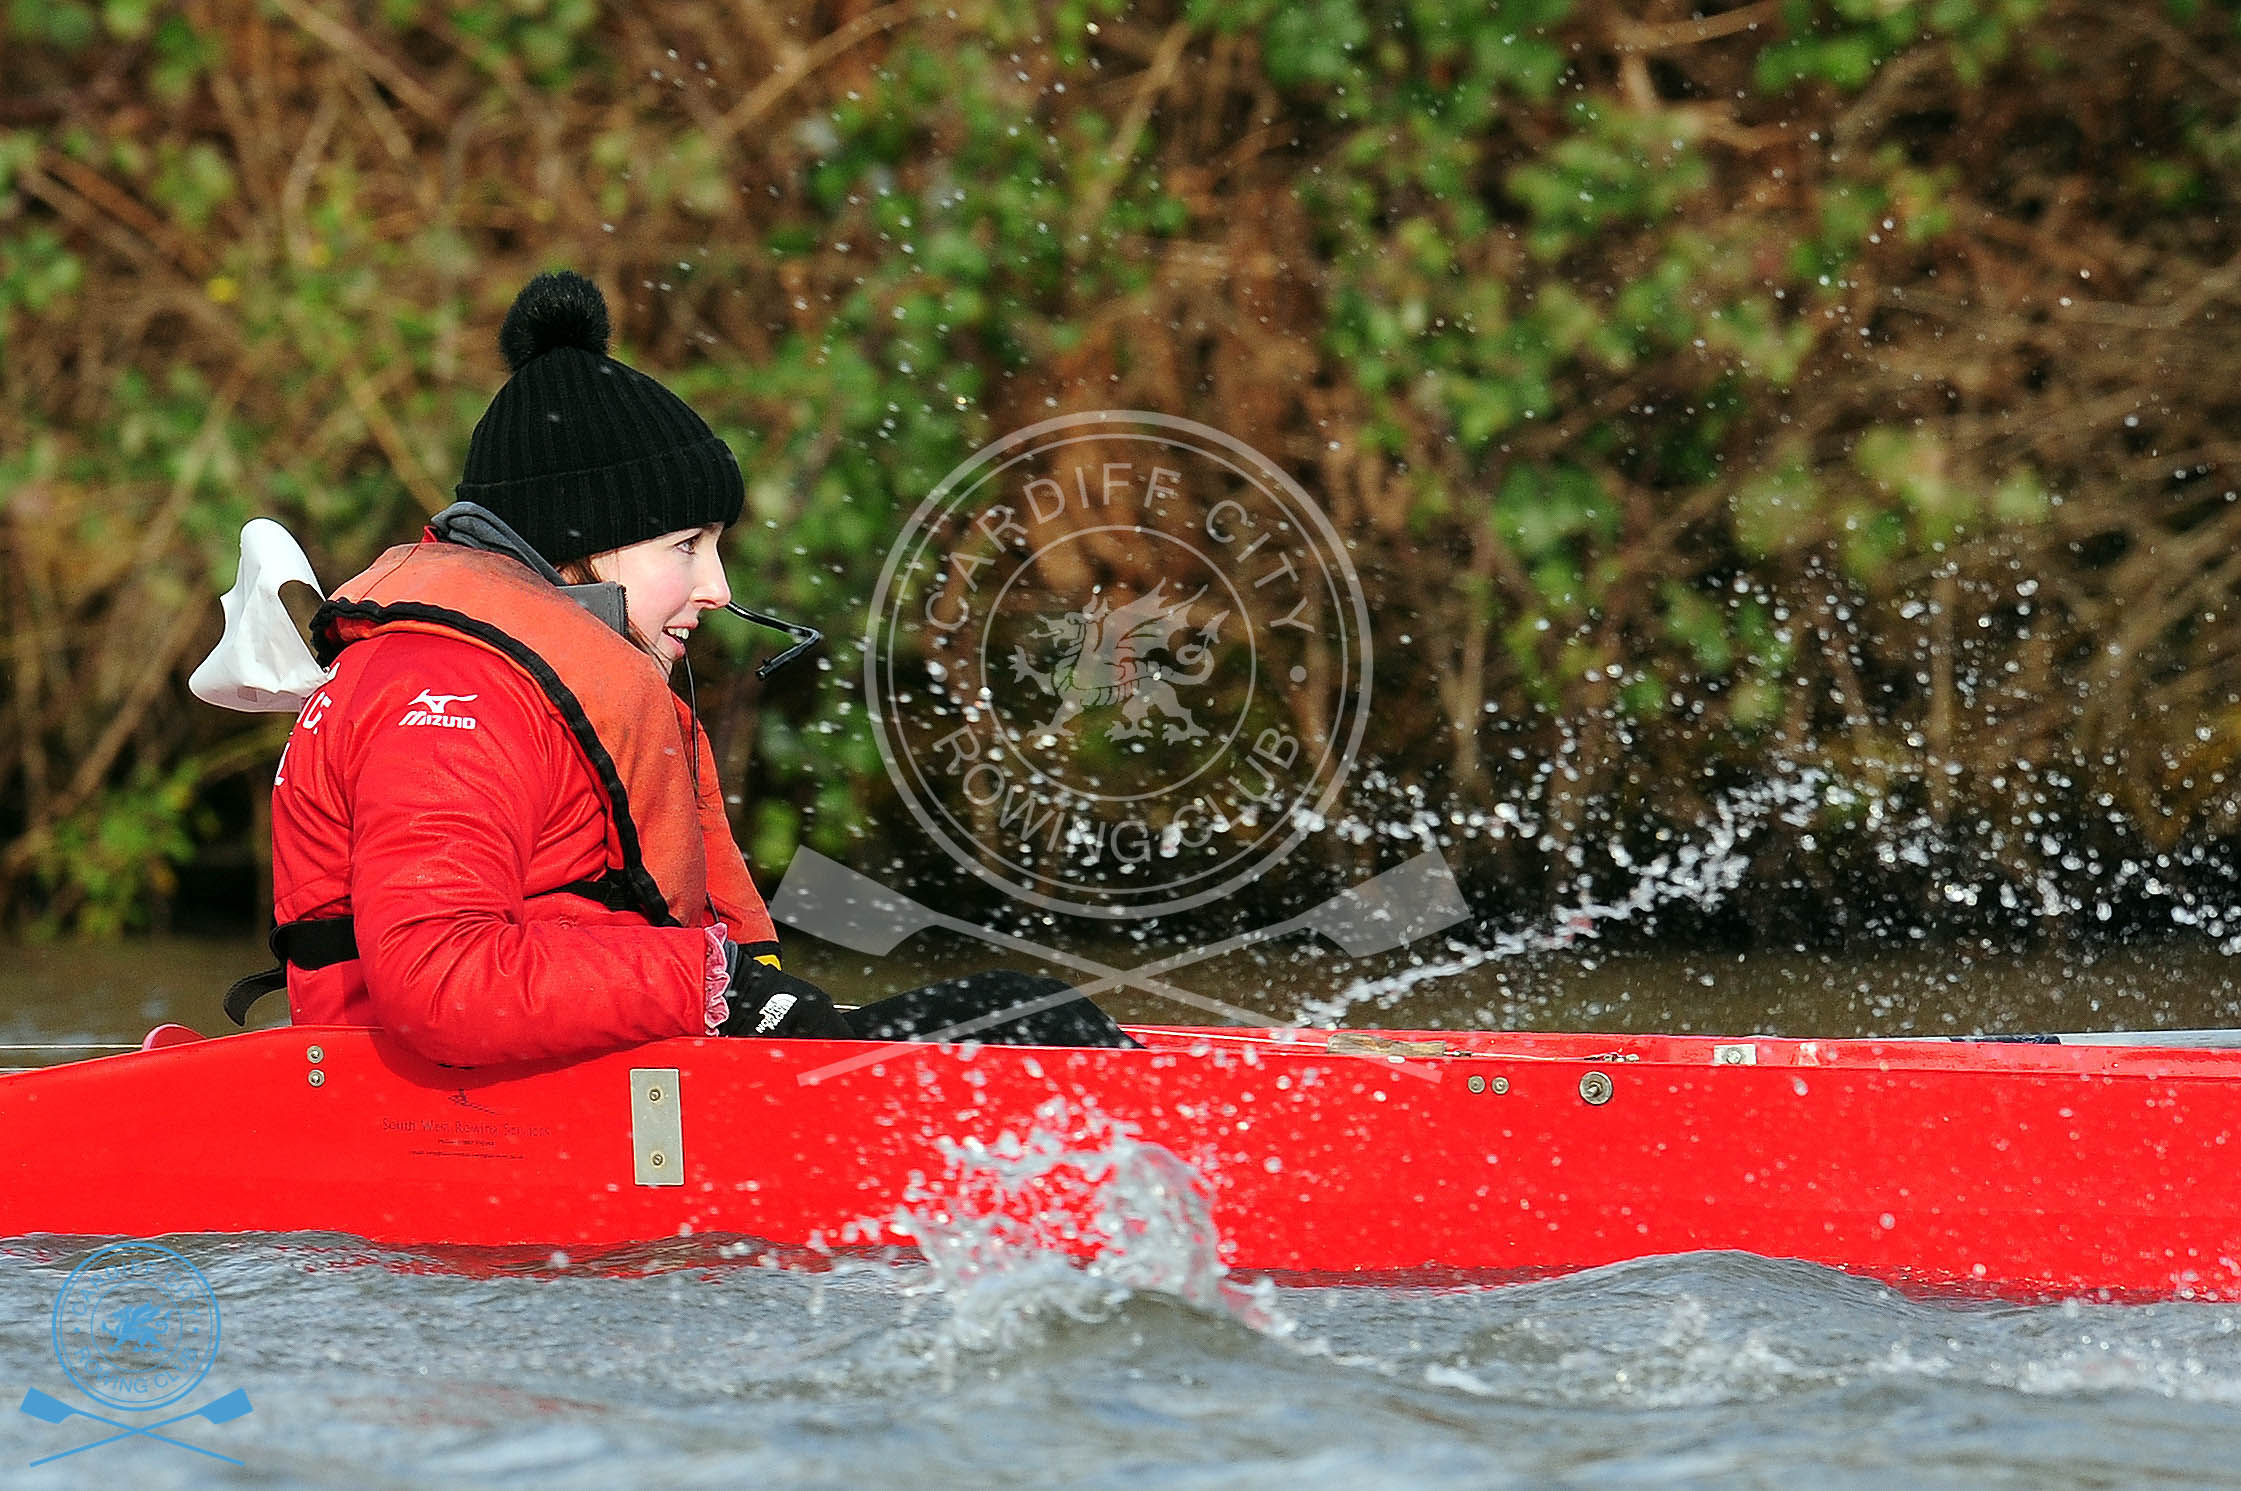 DW_280119_Cardiff_City_Rowing_263.jpg